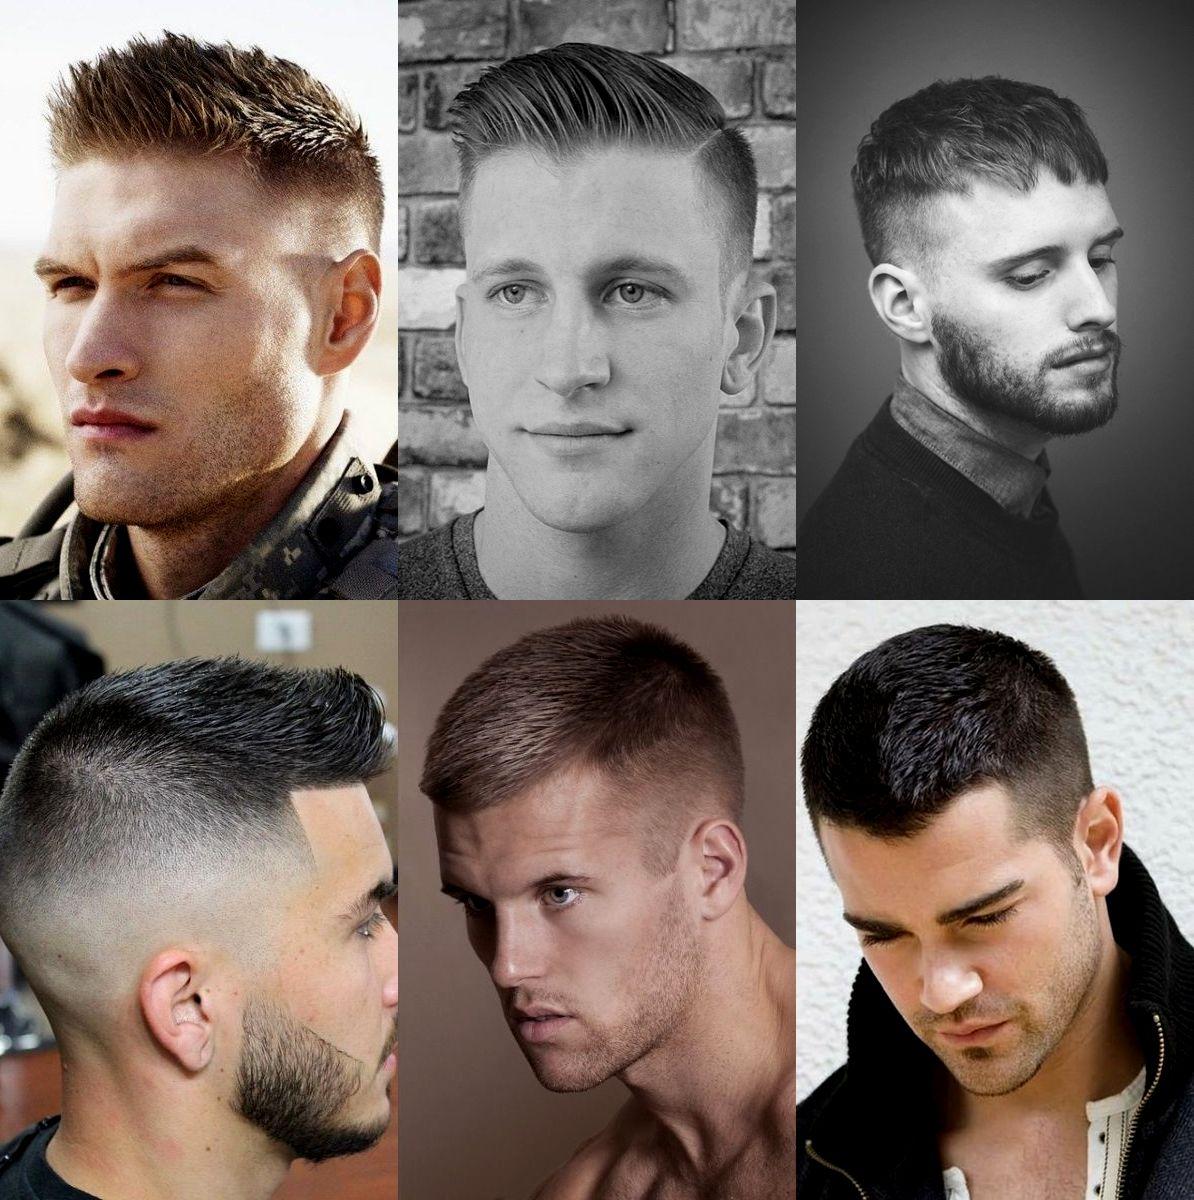 legal os melhores cortes de cabelo masculino 2017 inspiração-Top Os Melhores Cortes De Cabelo Masculino 2017 Layout